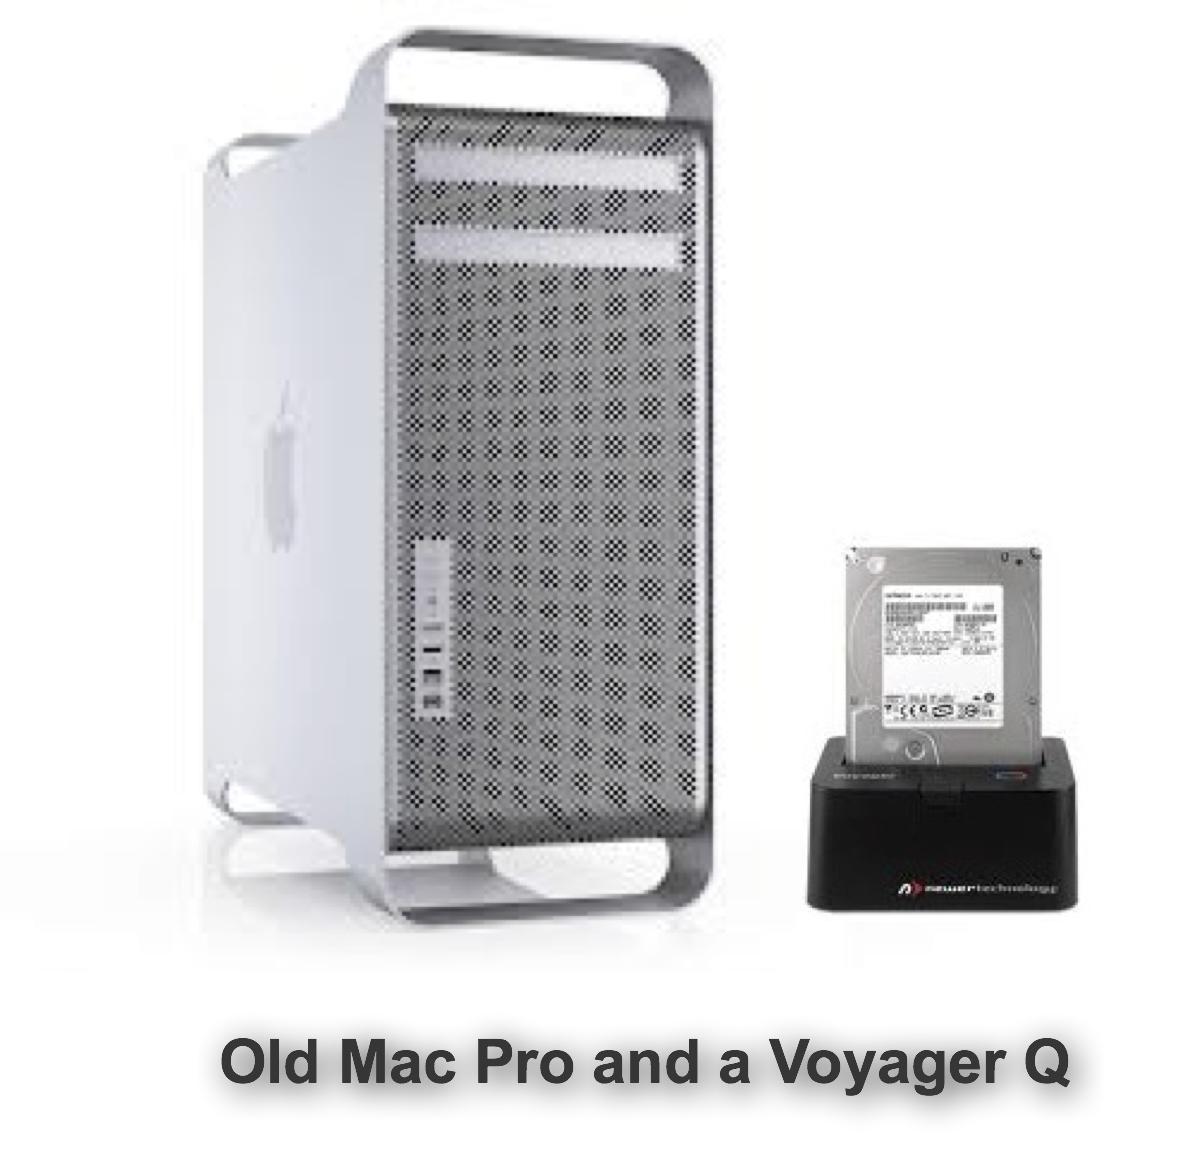 Voyager Q